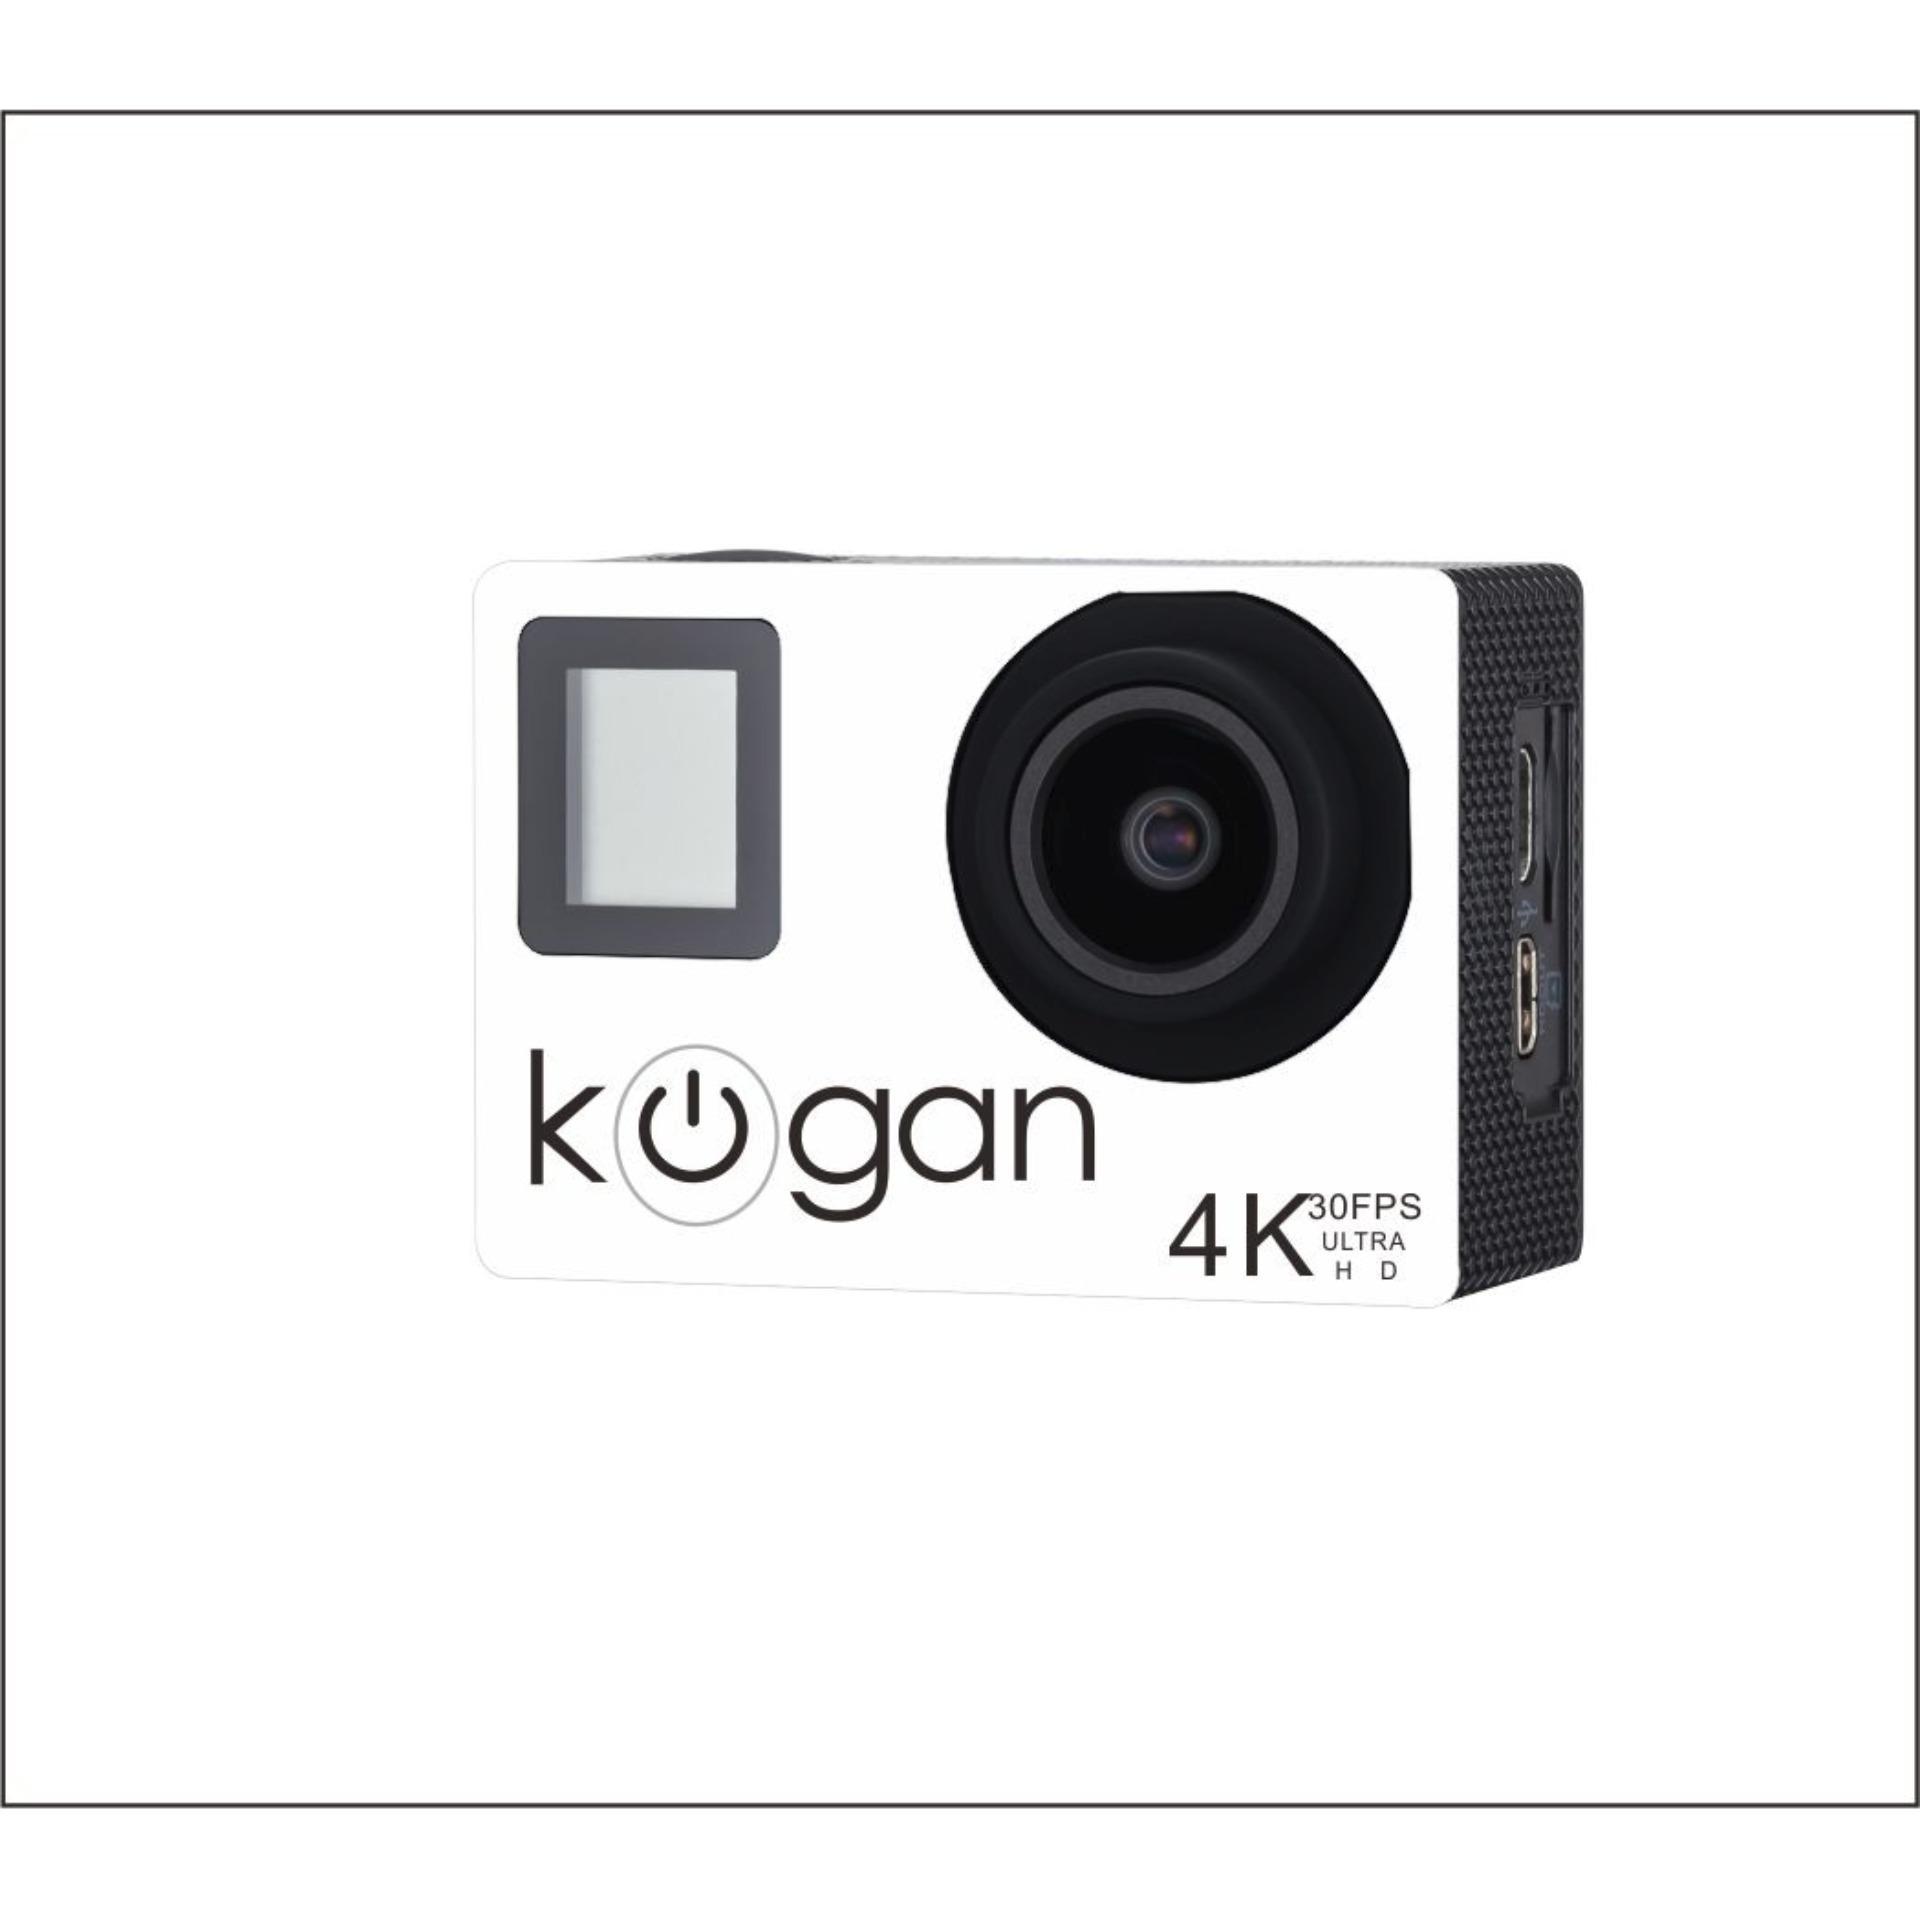 Harga Saya Kogan Action Camera 4k Nv Ultrahd 16mp Putih Wifi Kamera Sport Go Pro Ultra Hd Microsd16gb Class 10